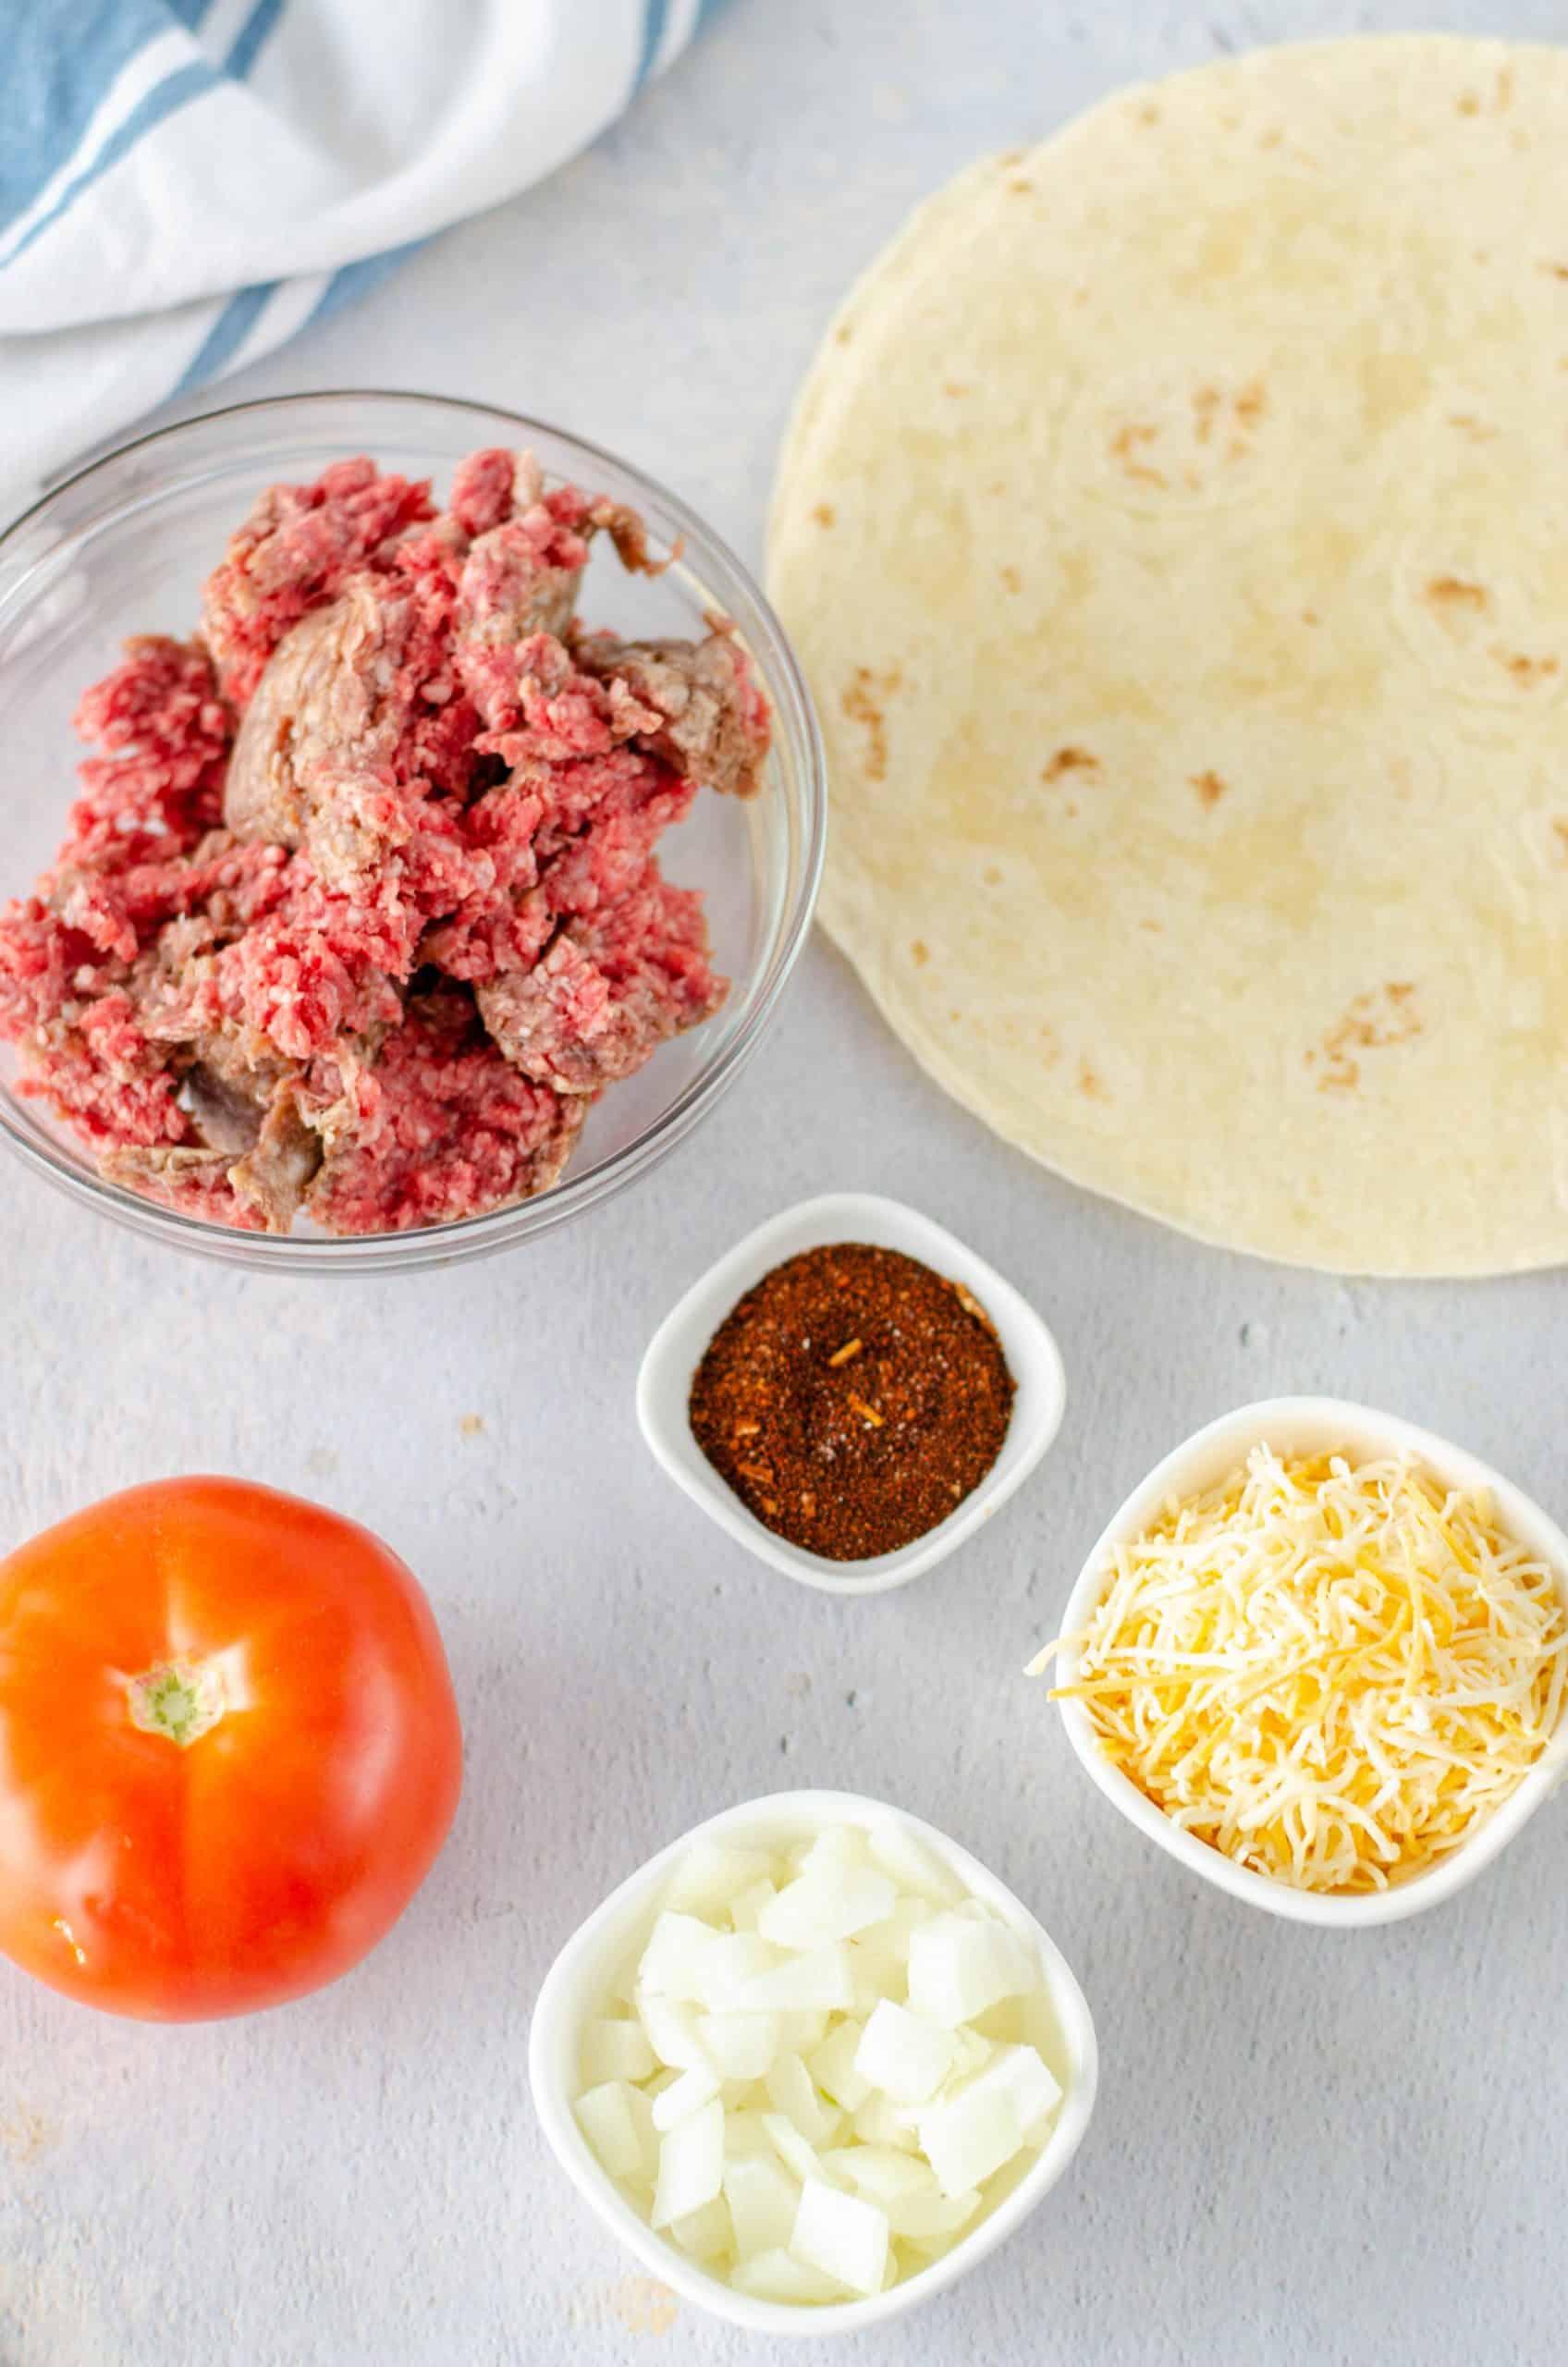 Ingredients needed to make Taco Quesadillas